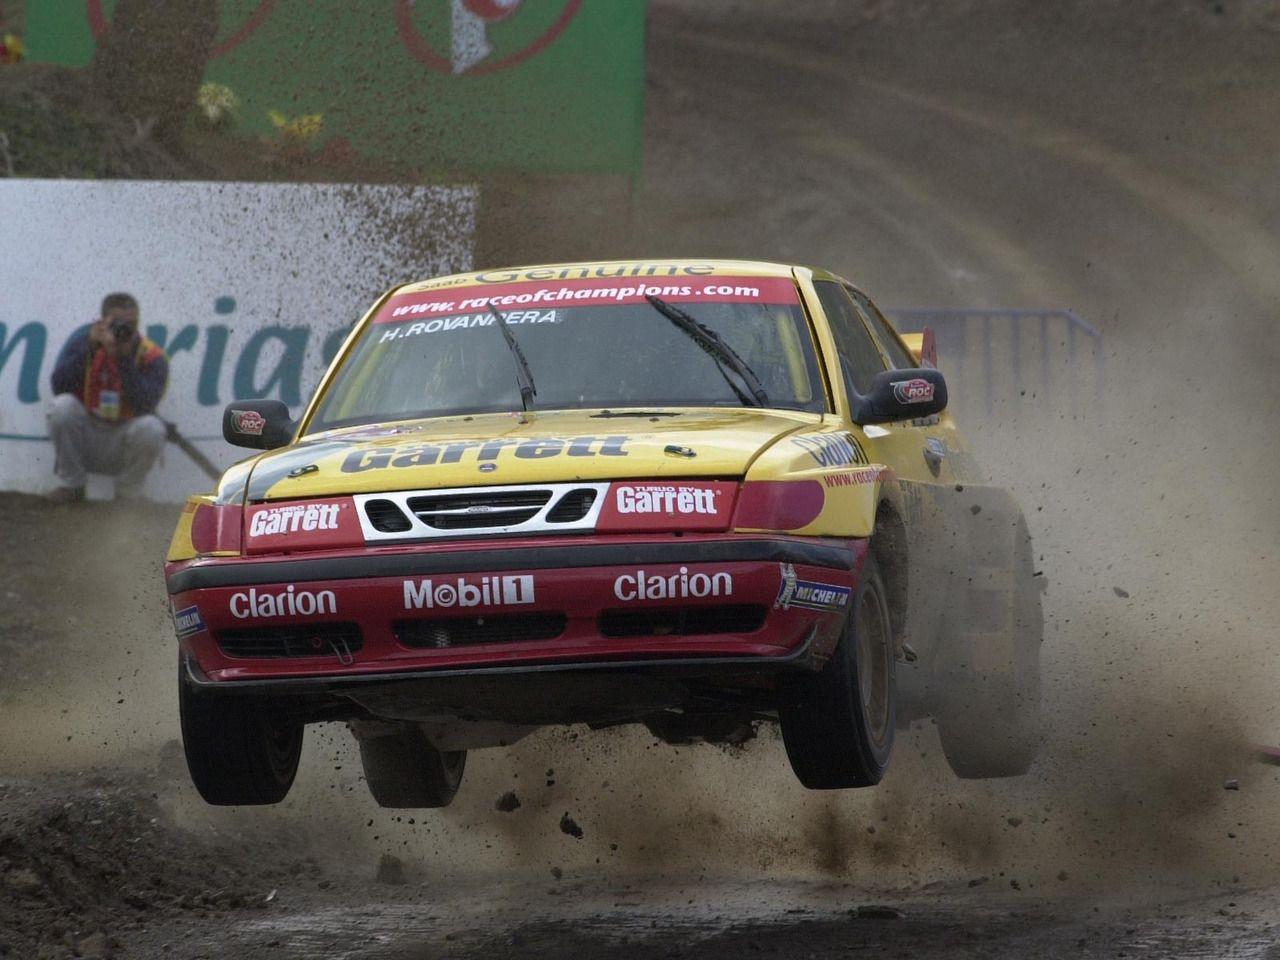 SAAB 9-3 rallycross car